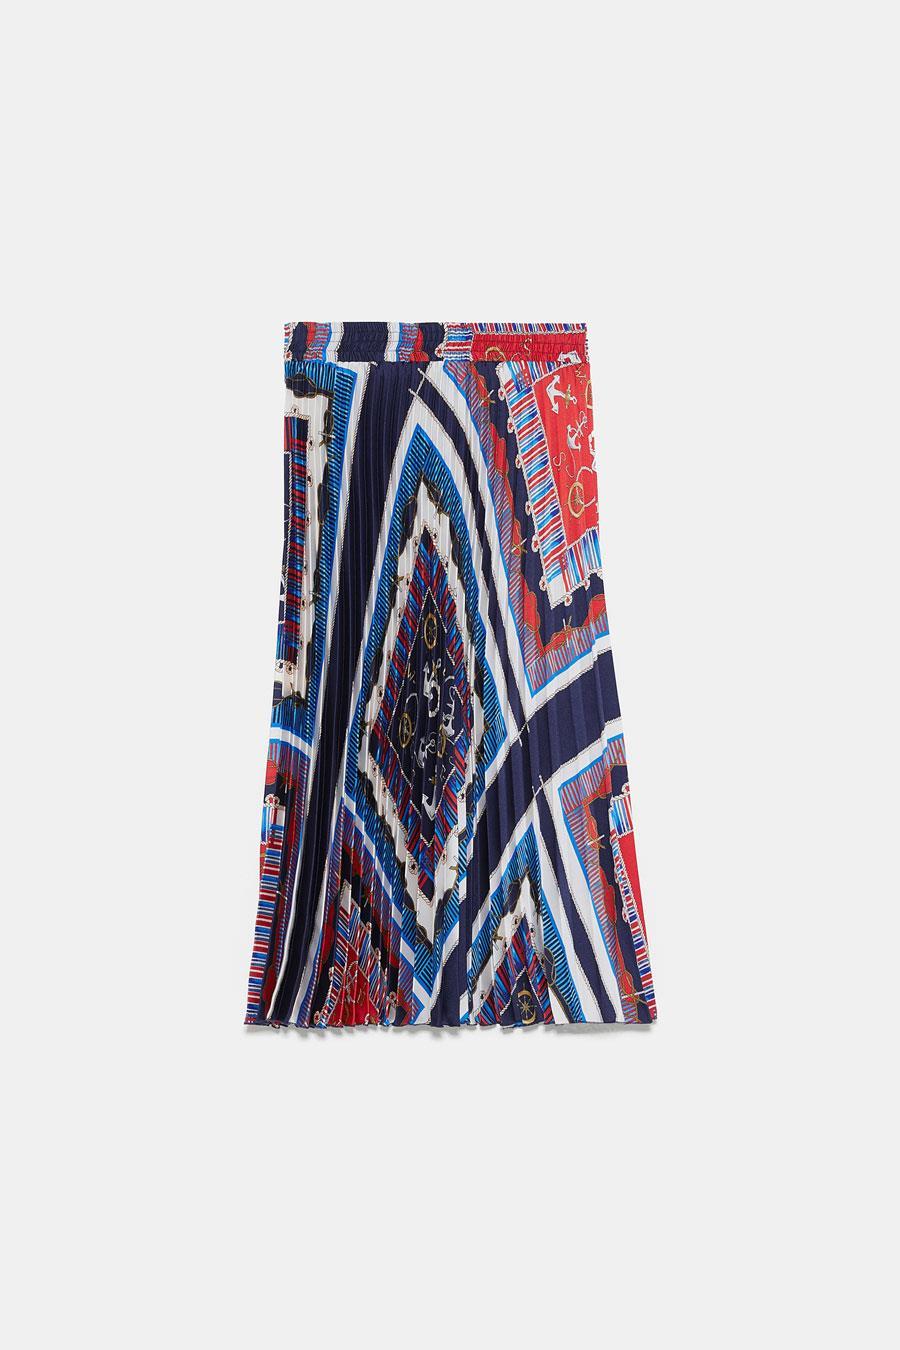 b4ab424070 falda plisada primavera verano 2019 falda estampada. Falda plisada con  estampado pañuelo